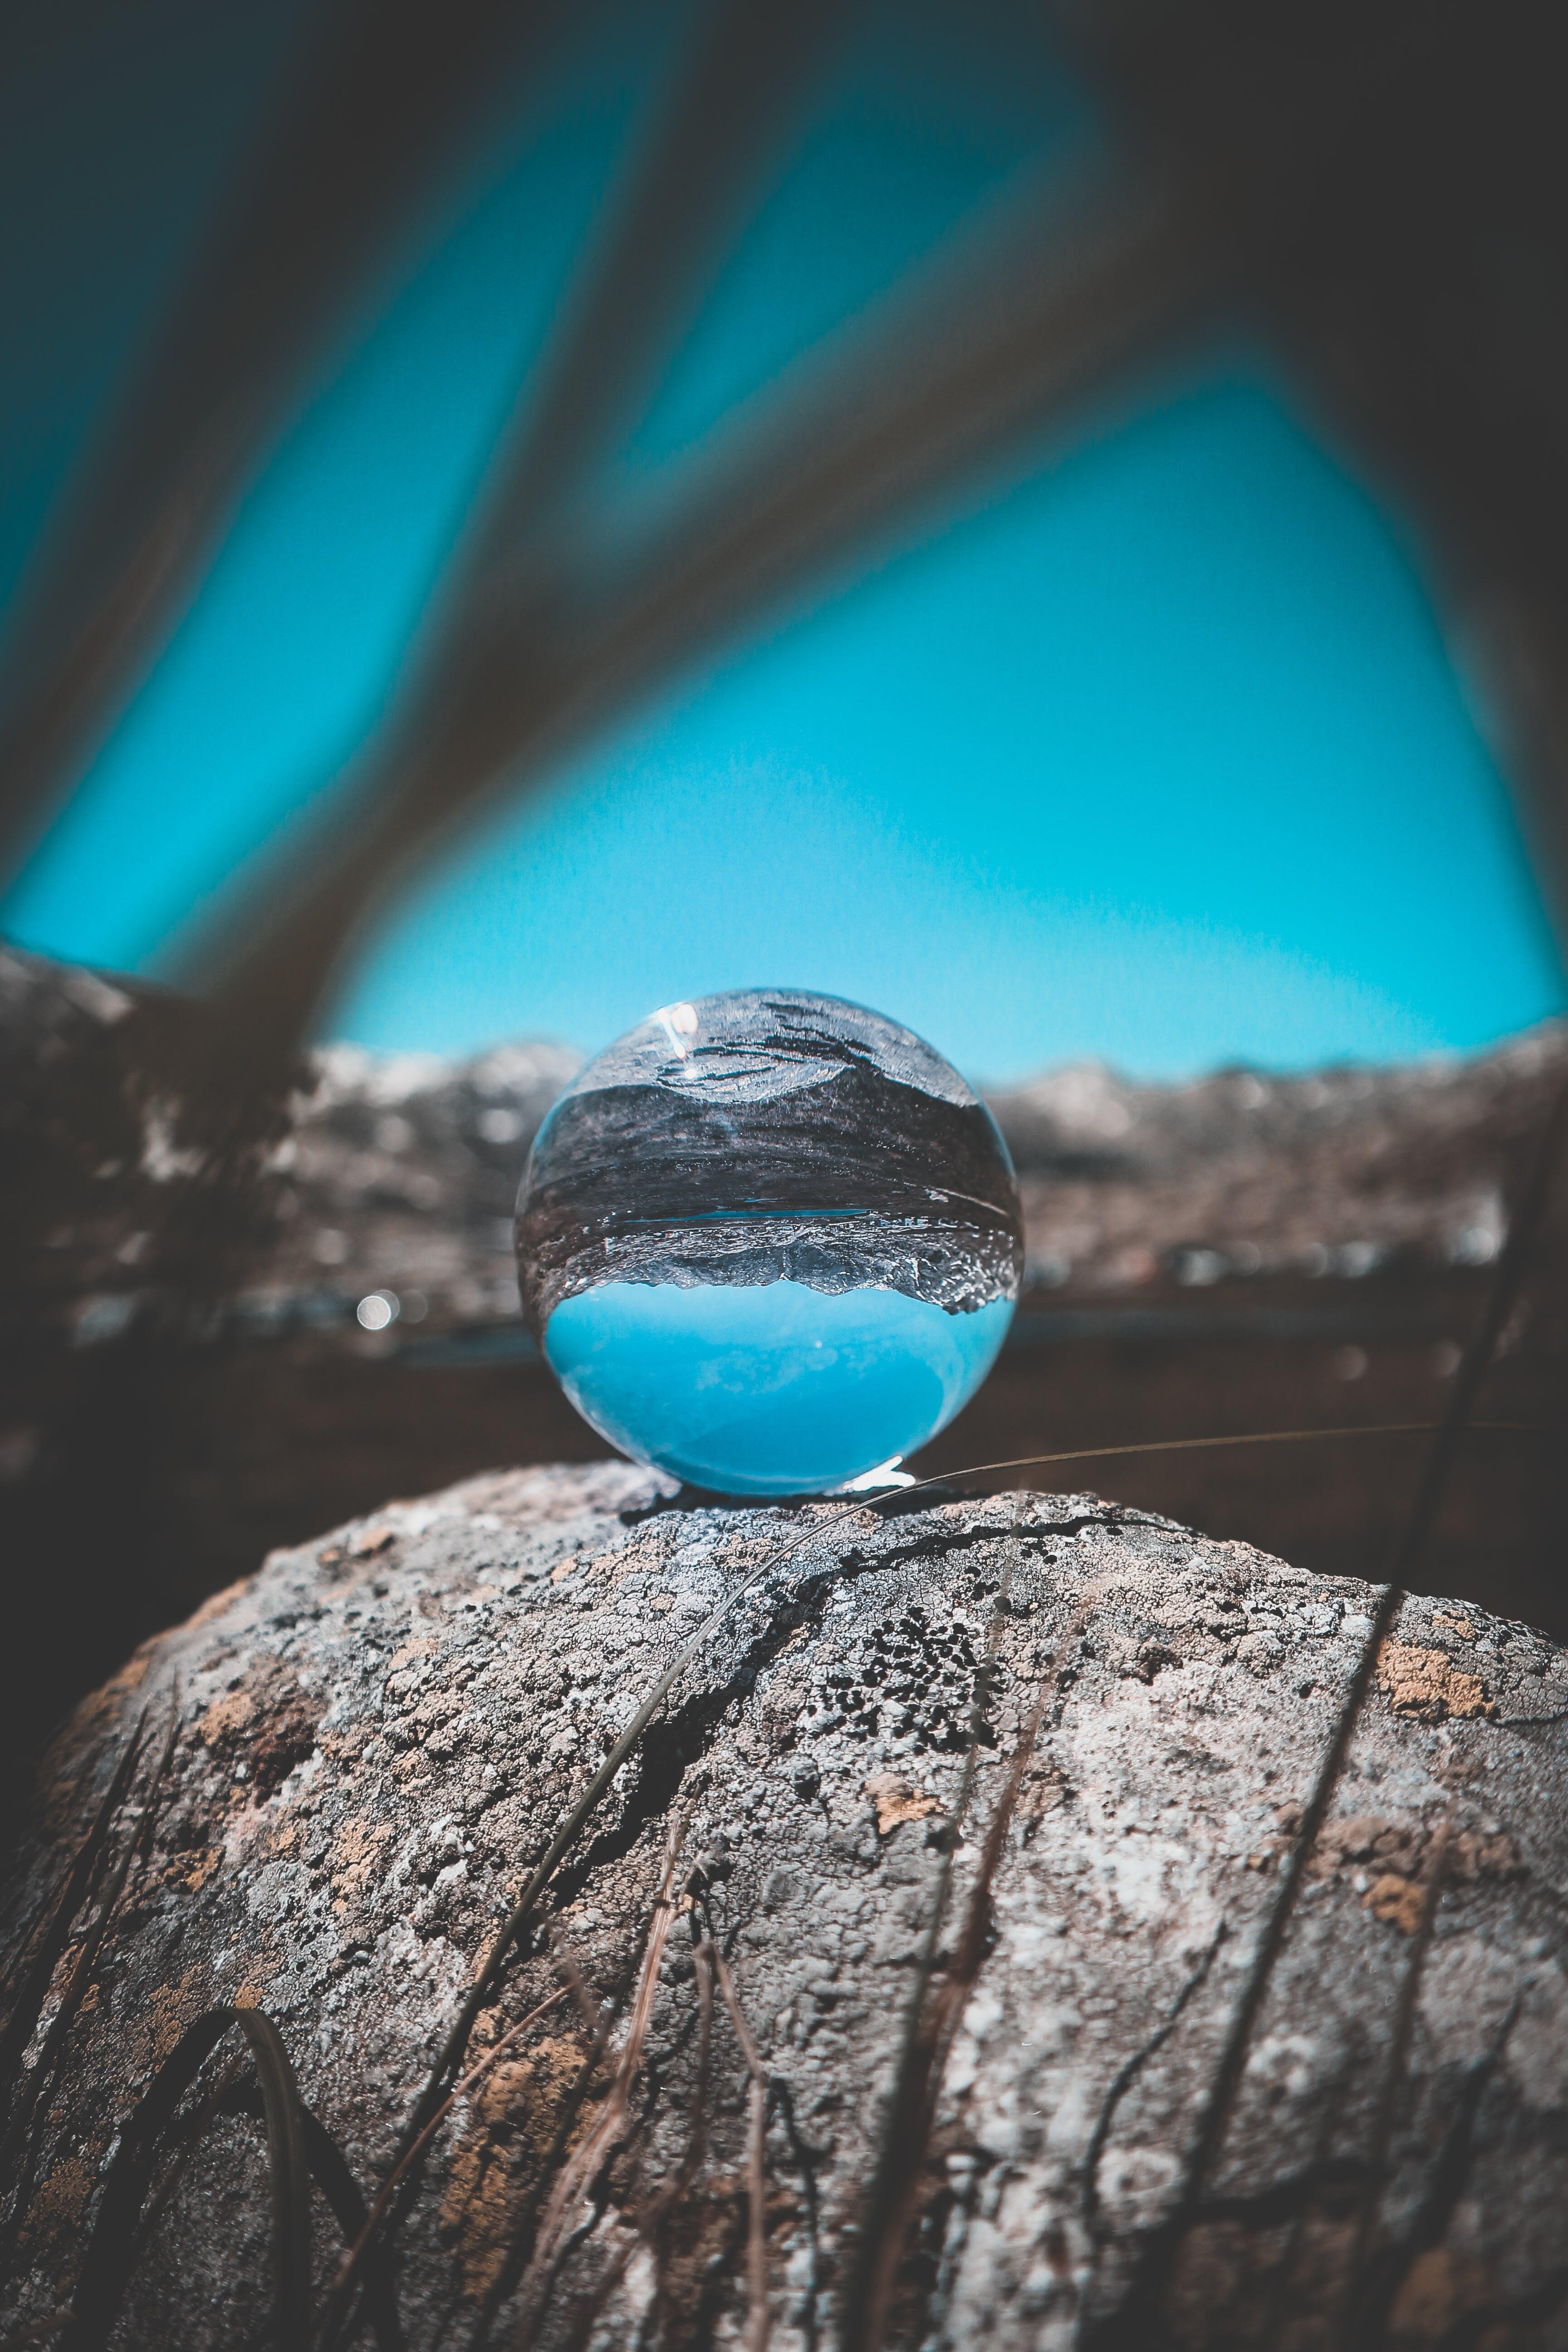 Crystal Ball on Rock